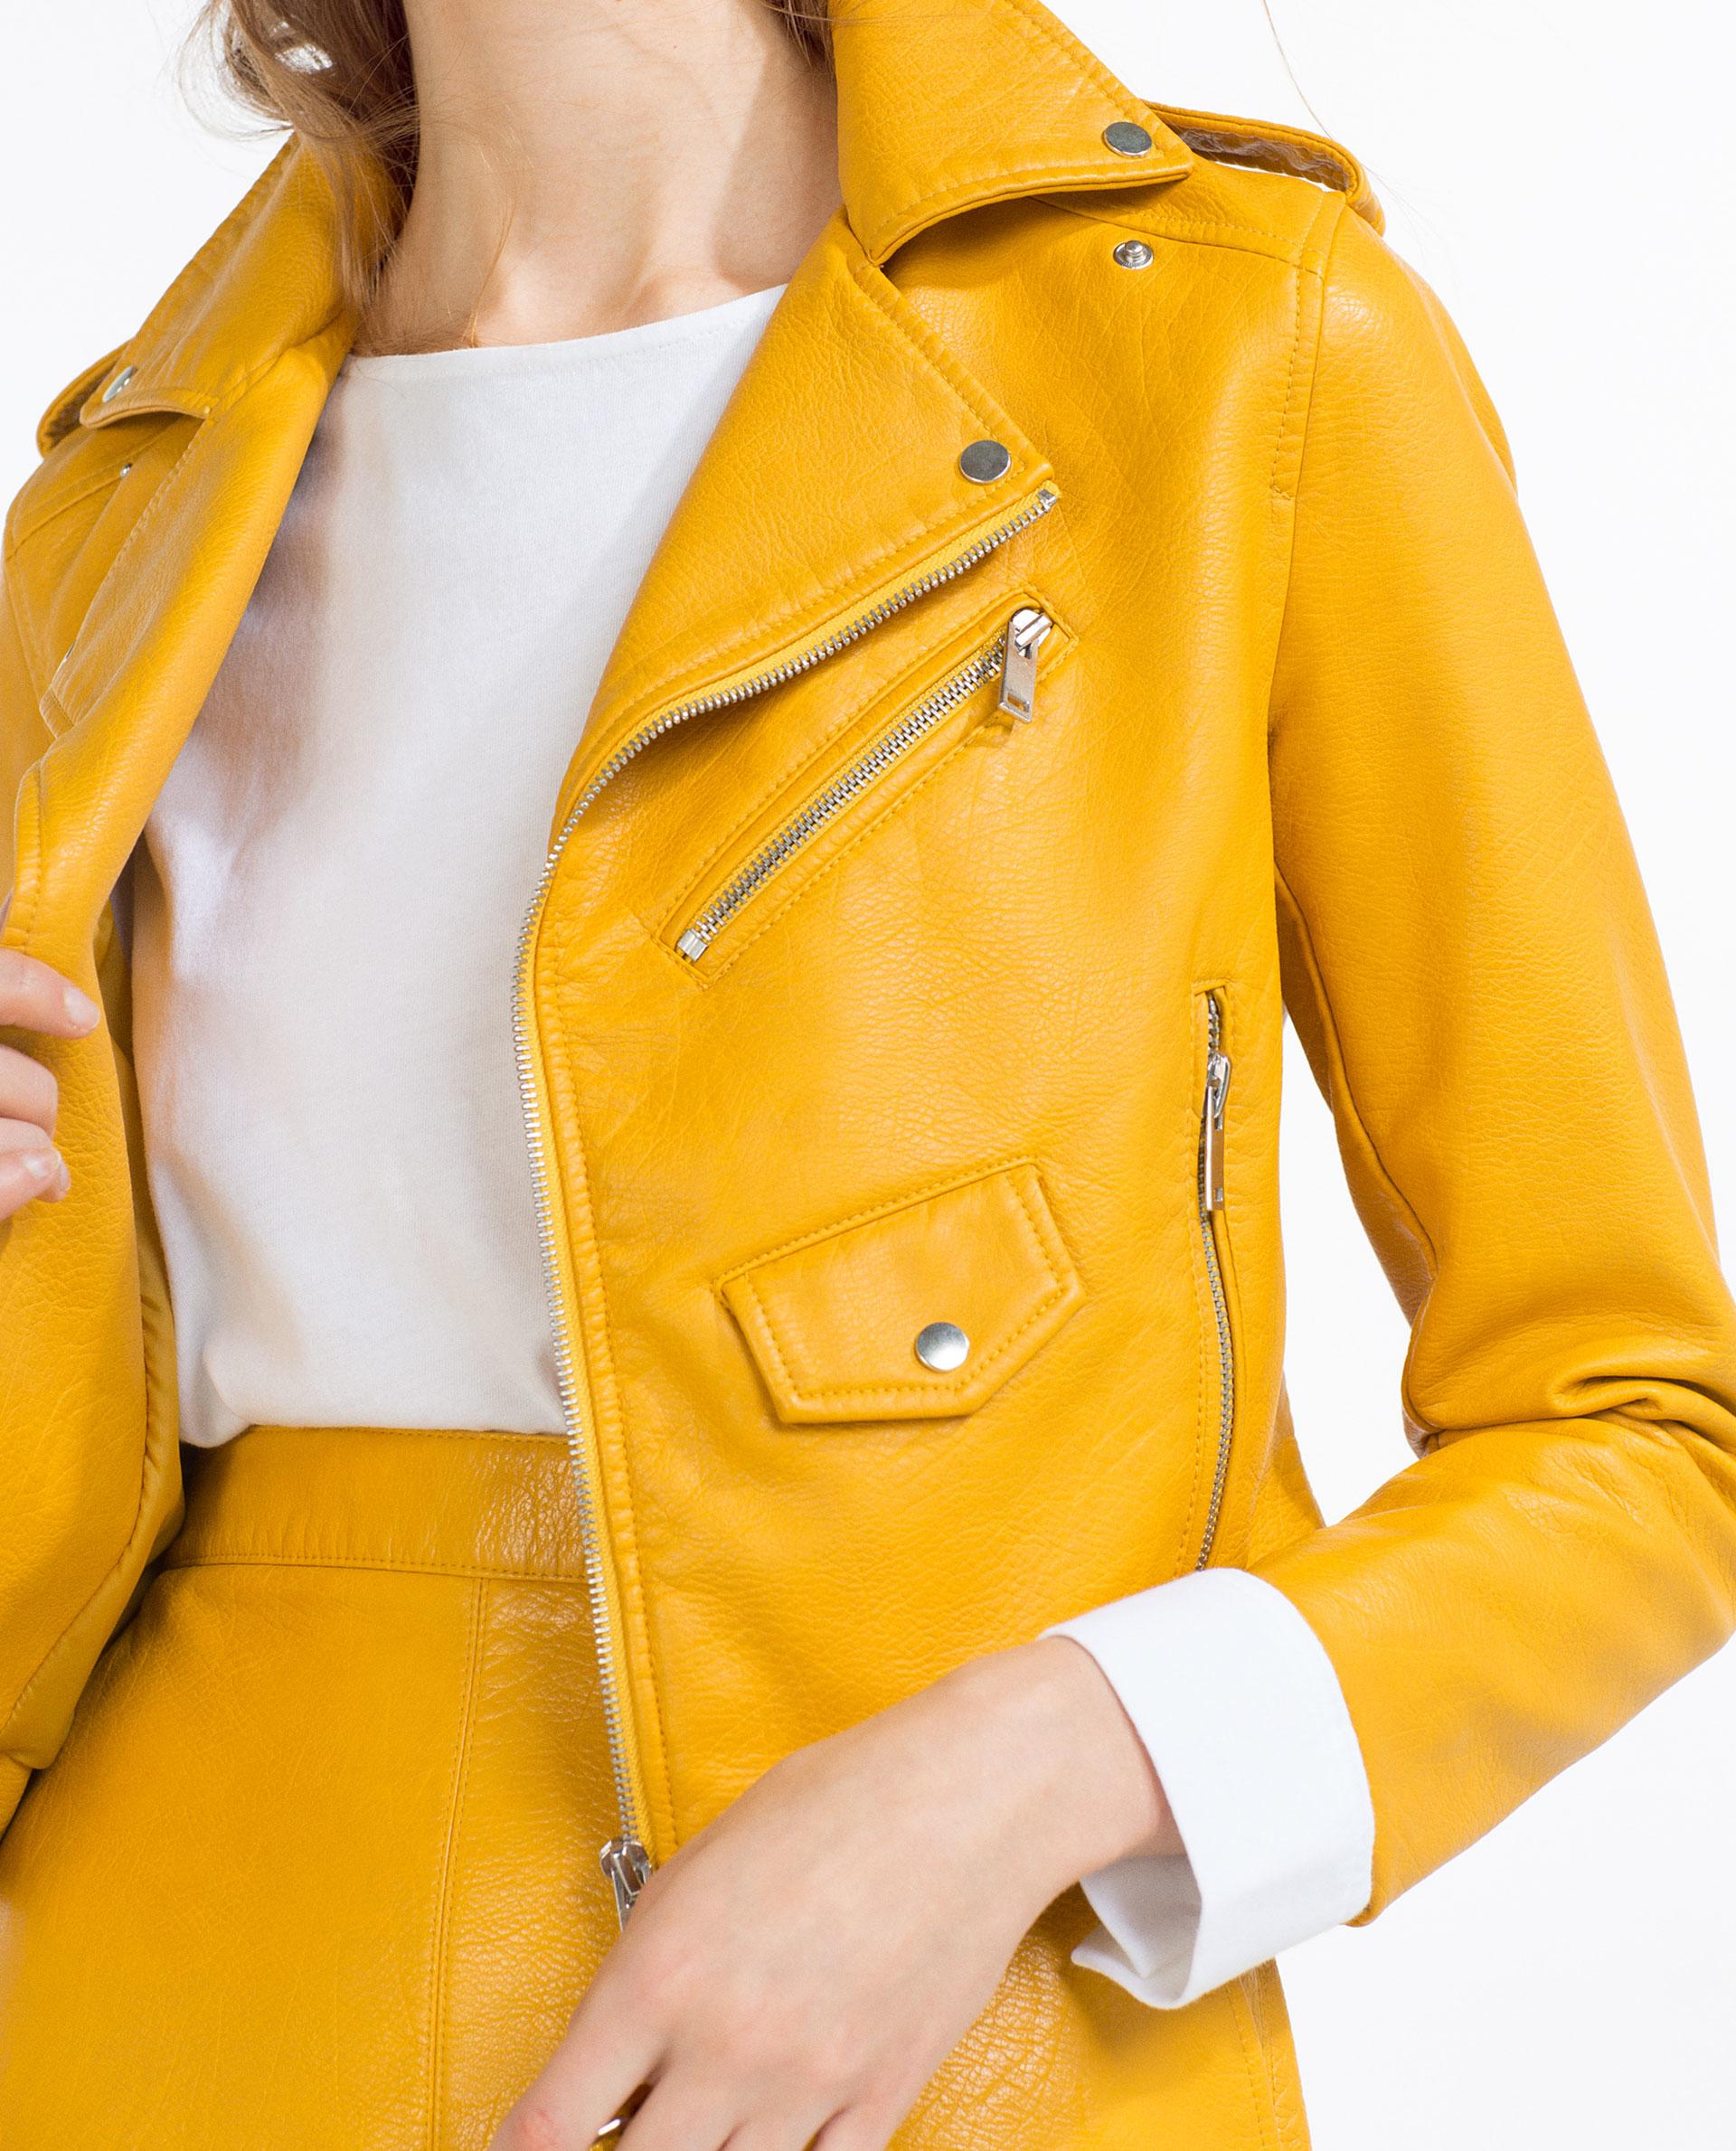 Leather jacket yellow zara - Gallery